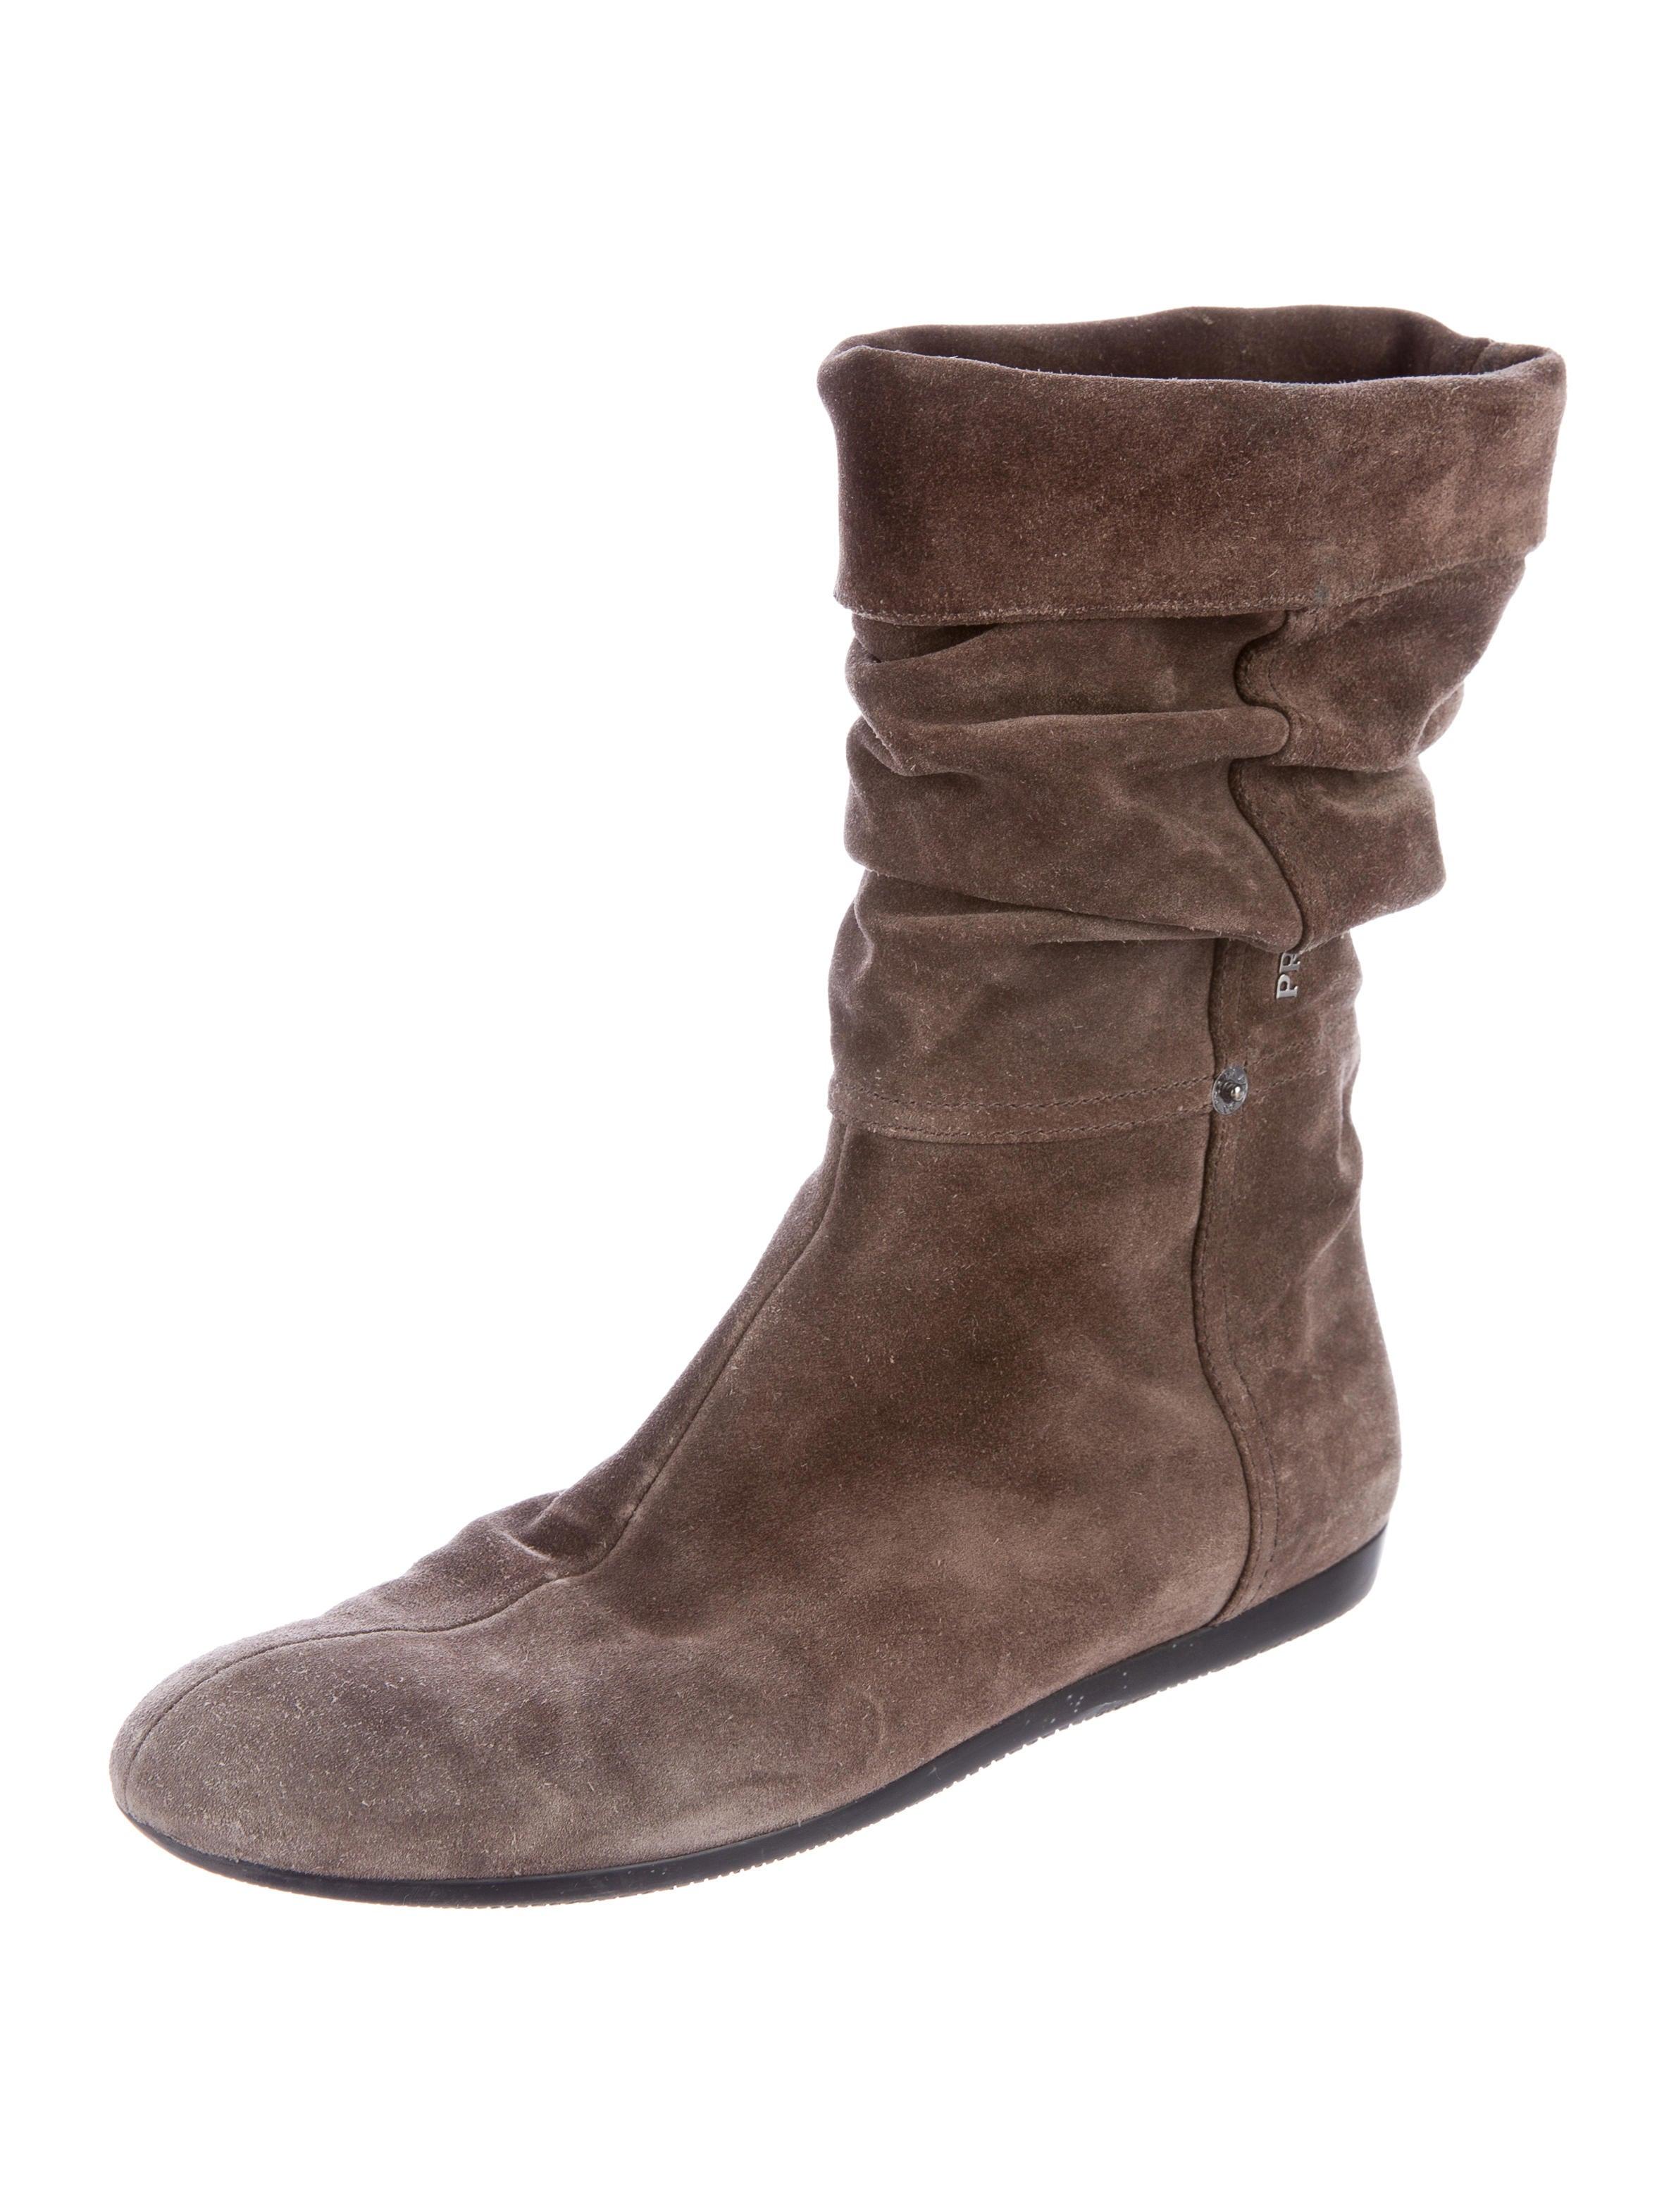 prada sport suede mid calf boots shoes wpr38427 the